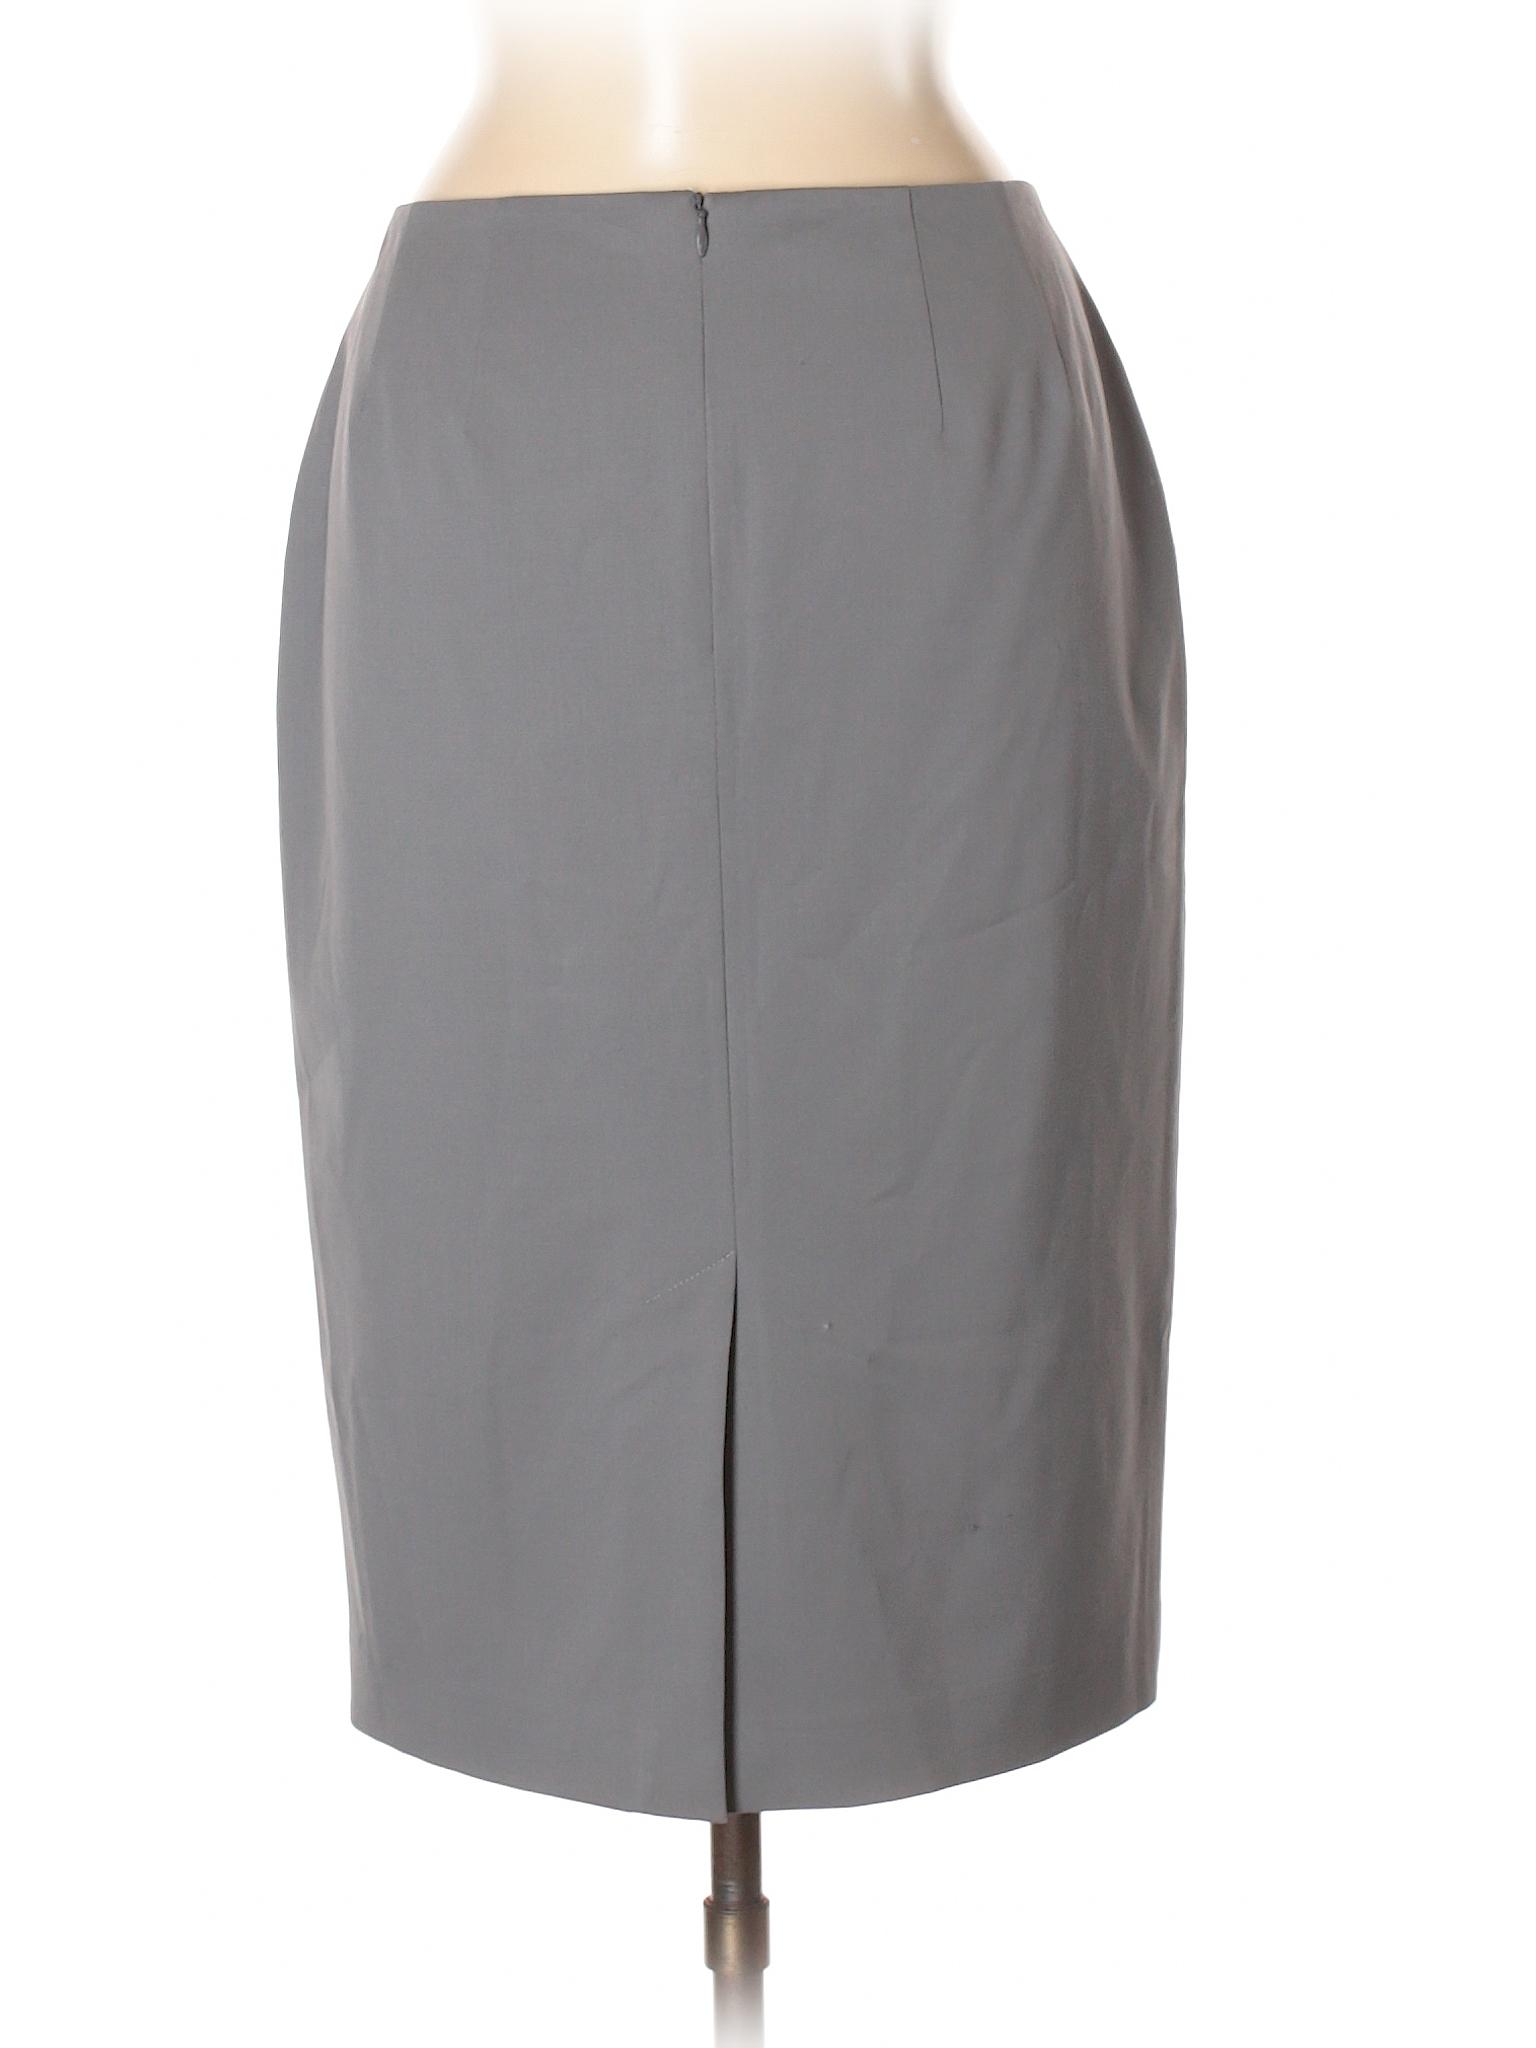 Casual Skirt Skirt Boutique Boutique Boutique Skirt Casual Casual Boutique Boutique Skirt Casual wHHFqrgI